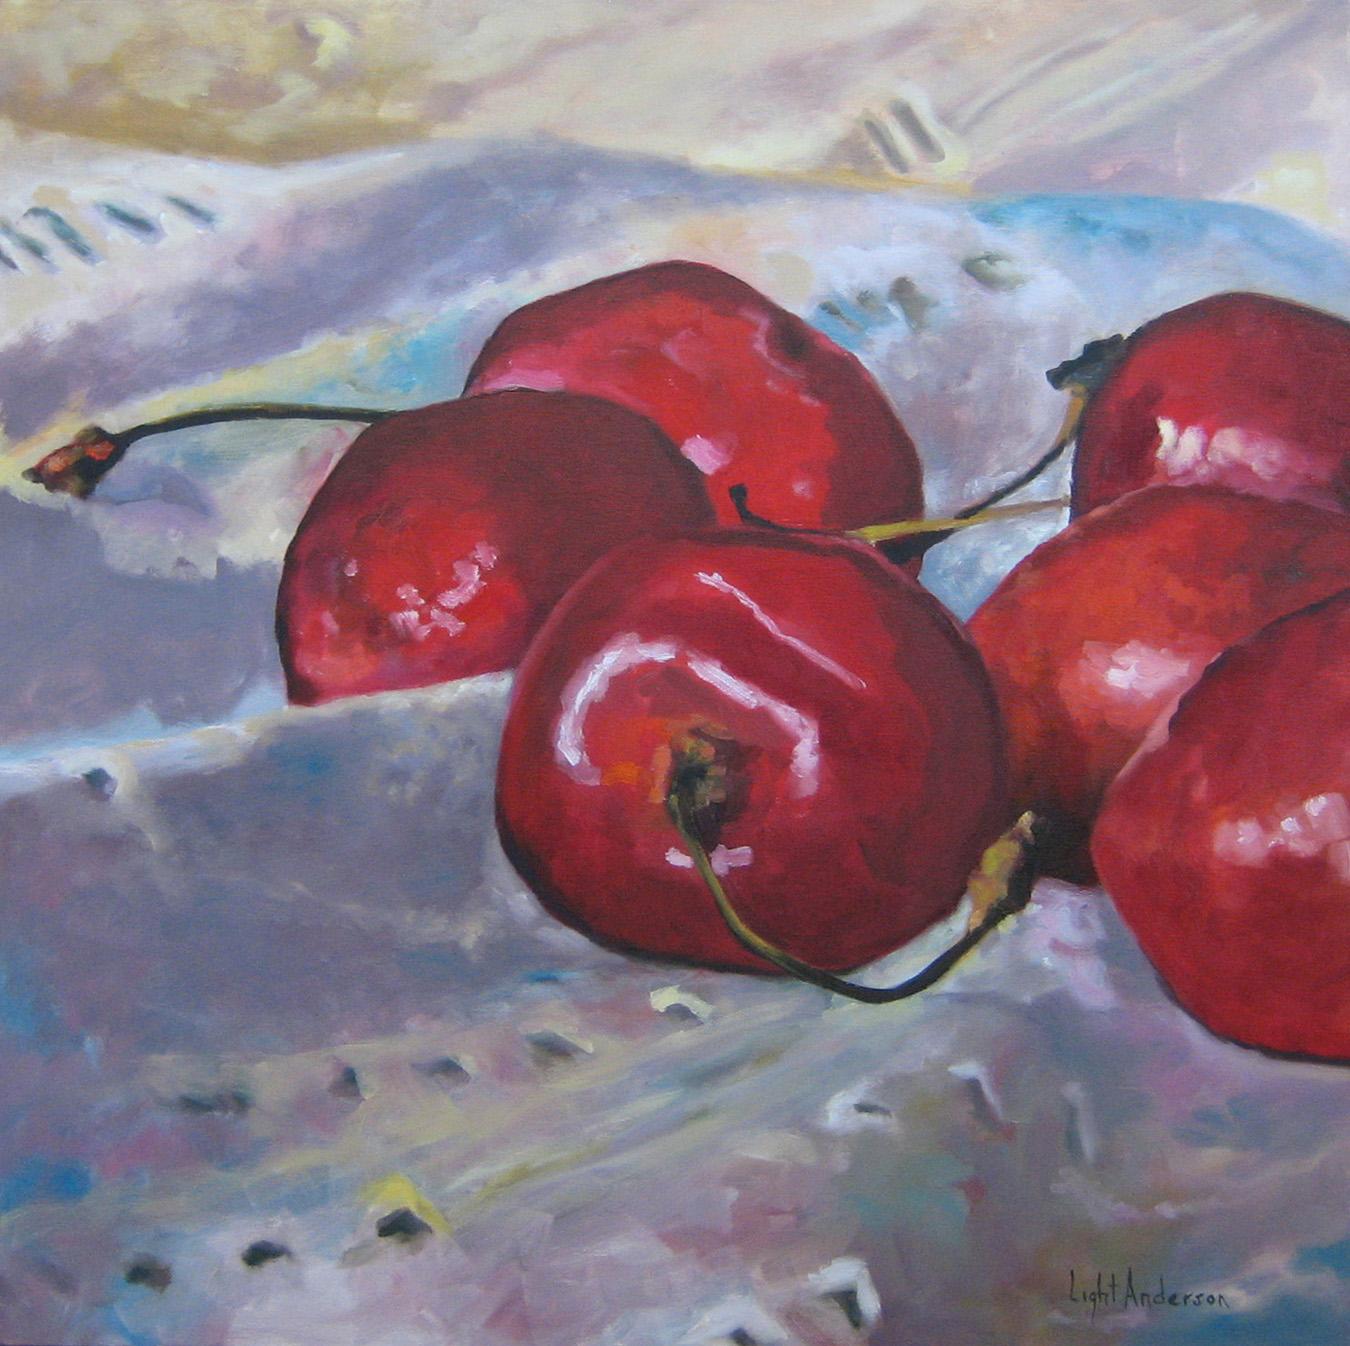 Cherries on Cloth